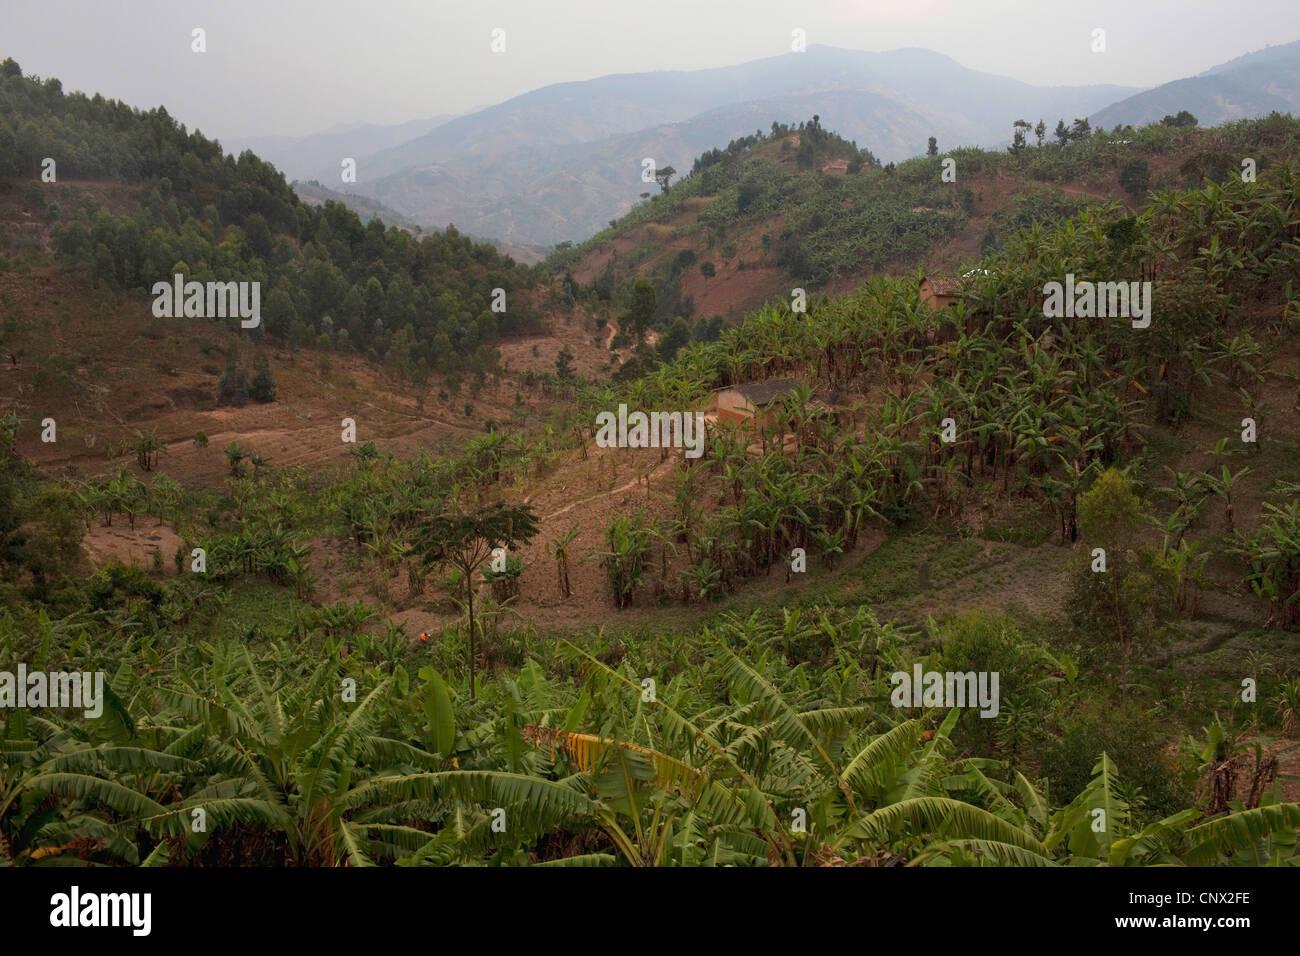 hilly landscape and banana fields, Burundi, Bujumbura Rural, Bugarama - Stock Image